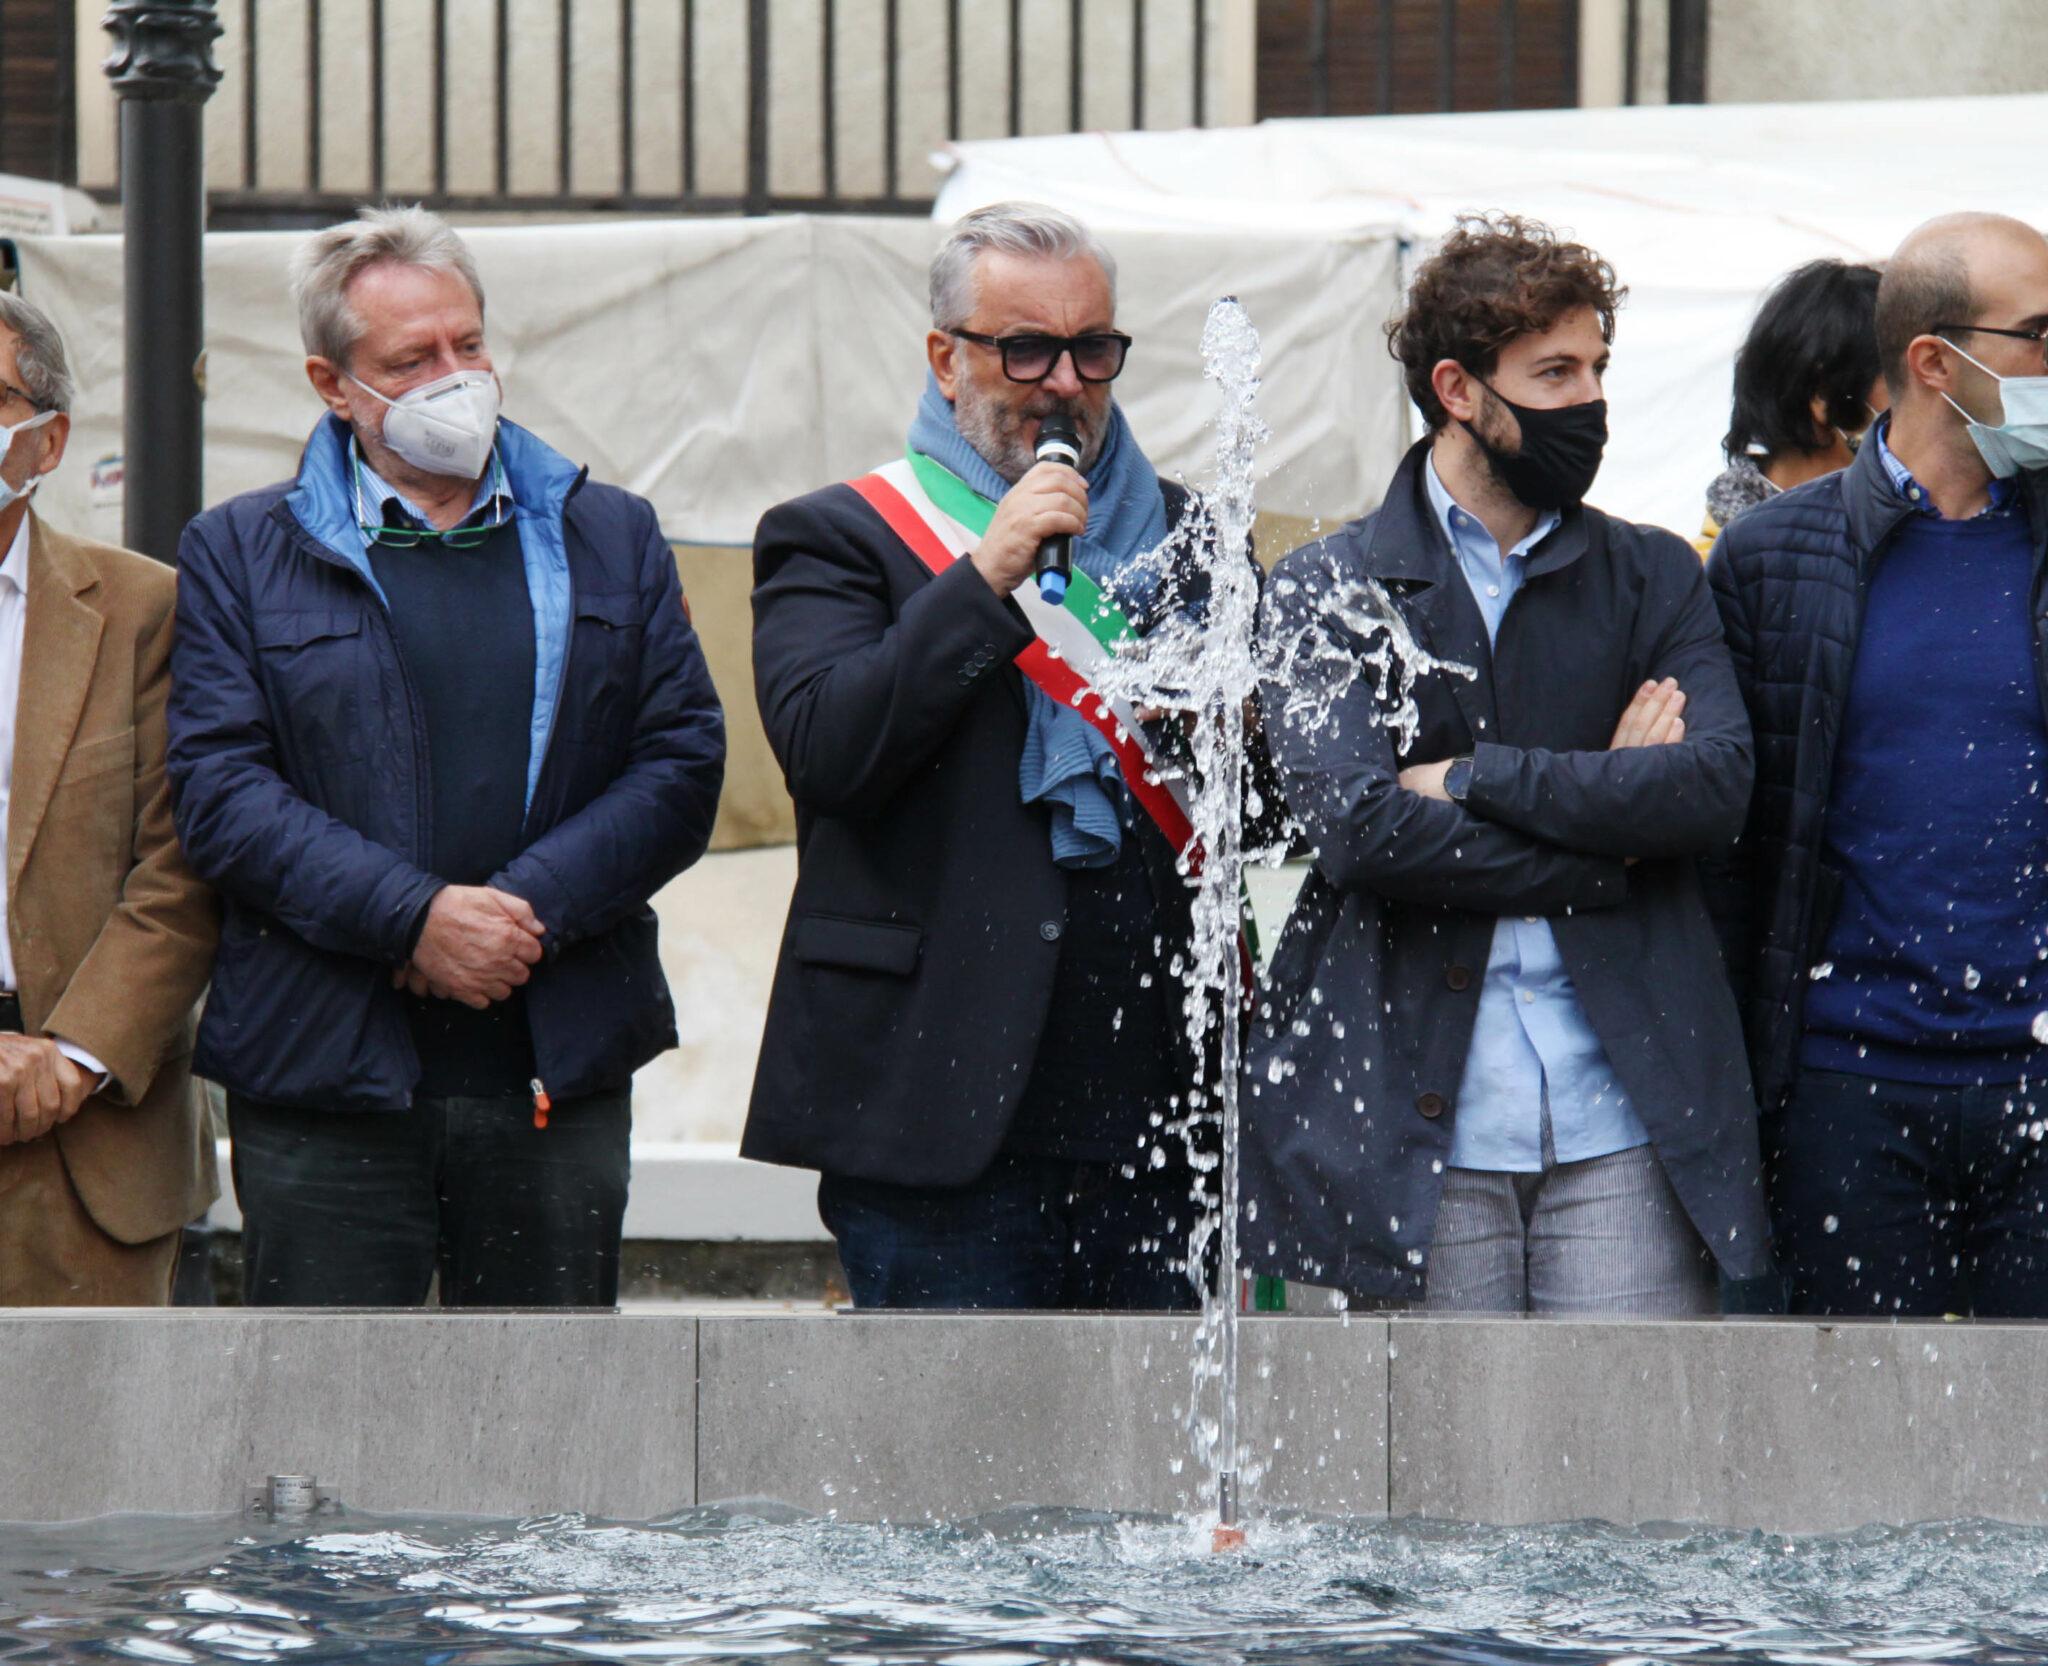 Interview with Carlo Giacone, Mayor of Giaveno (Turin)